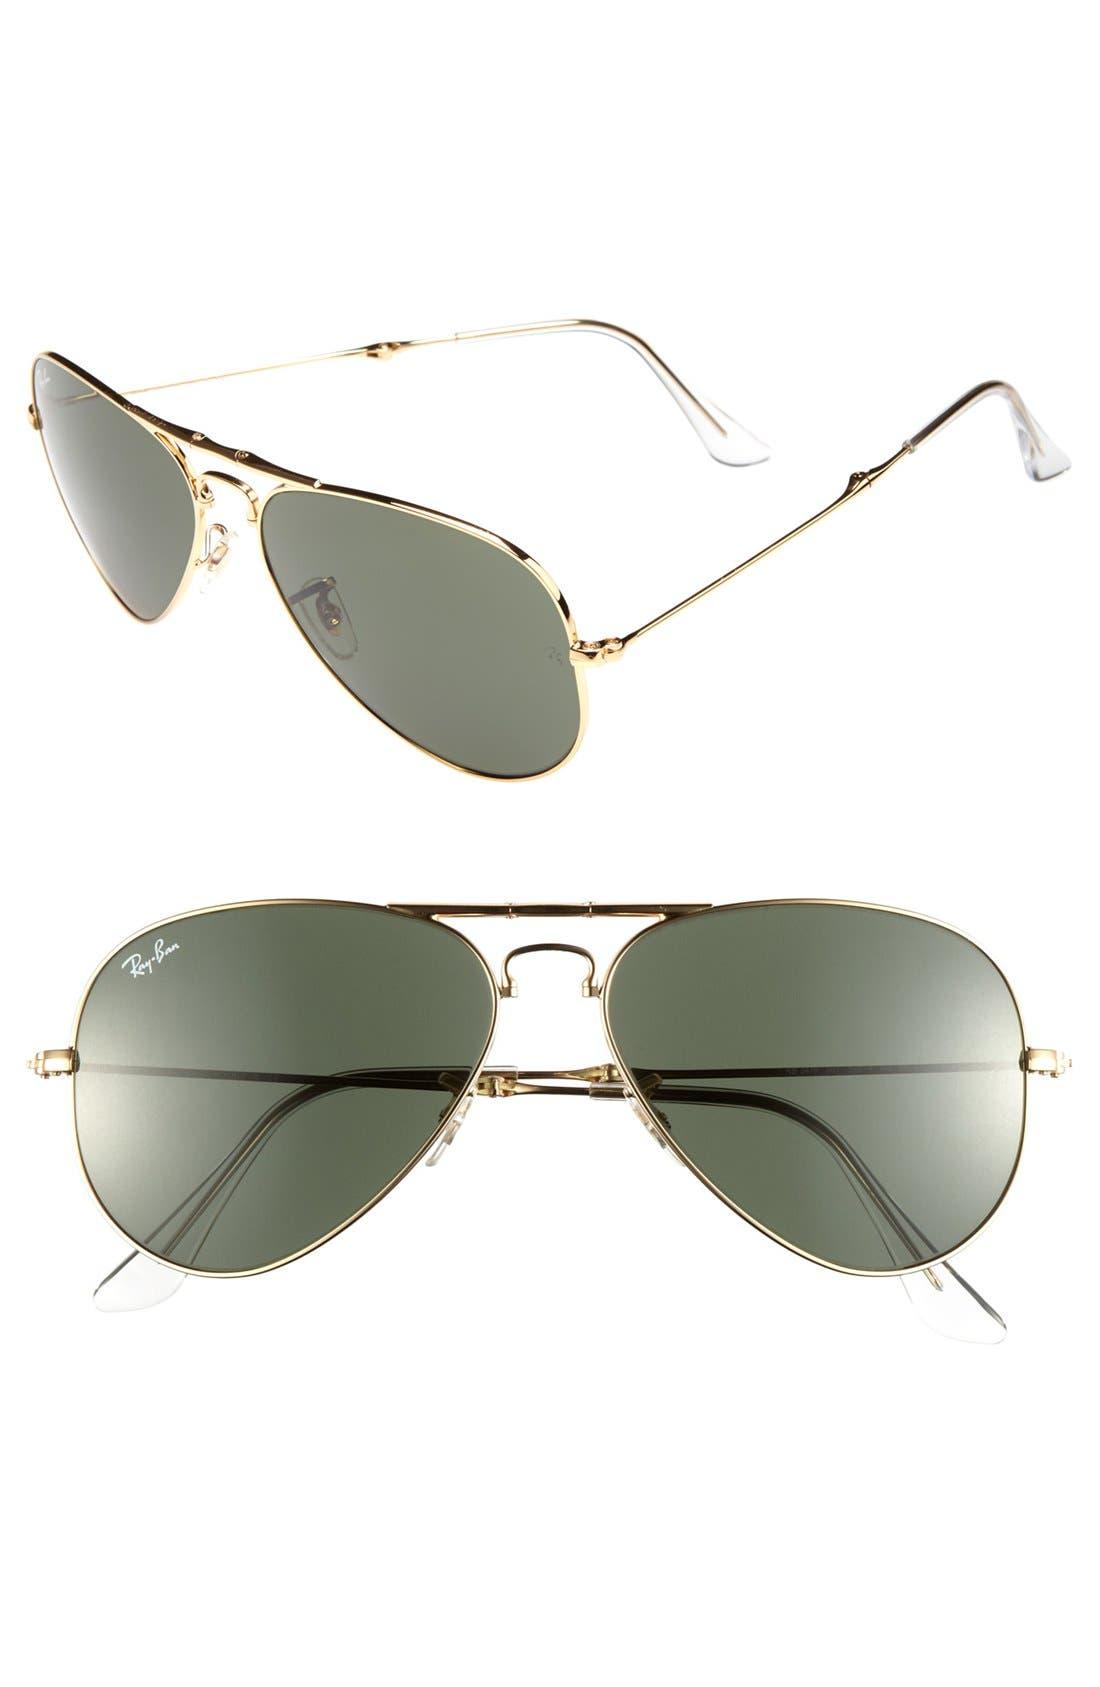 Main Image - Ray-Ban 58mm Folding Sunglasses